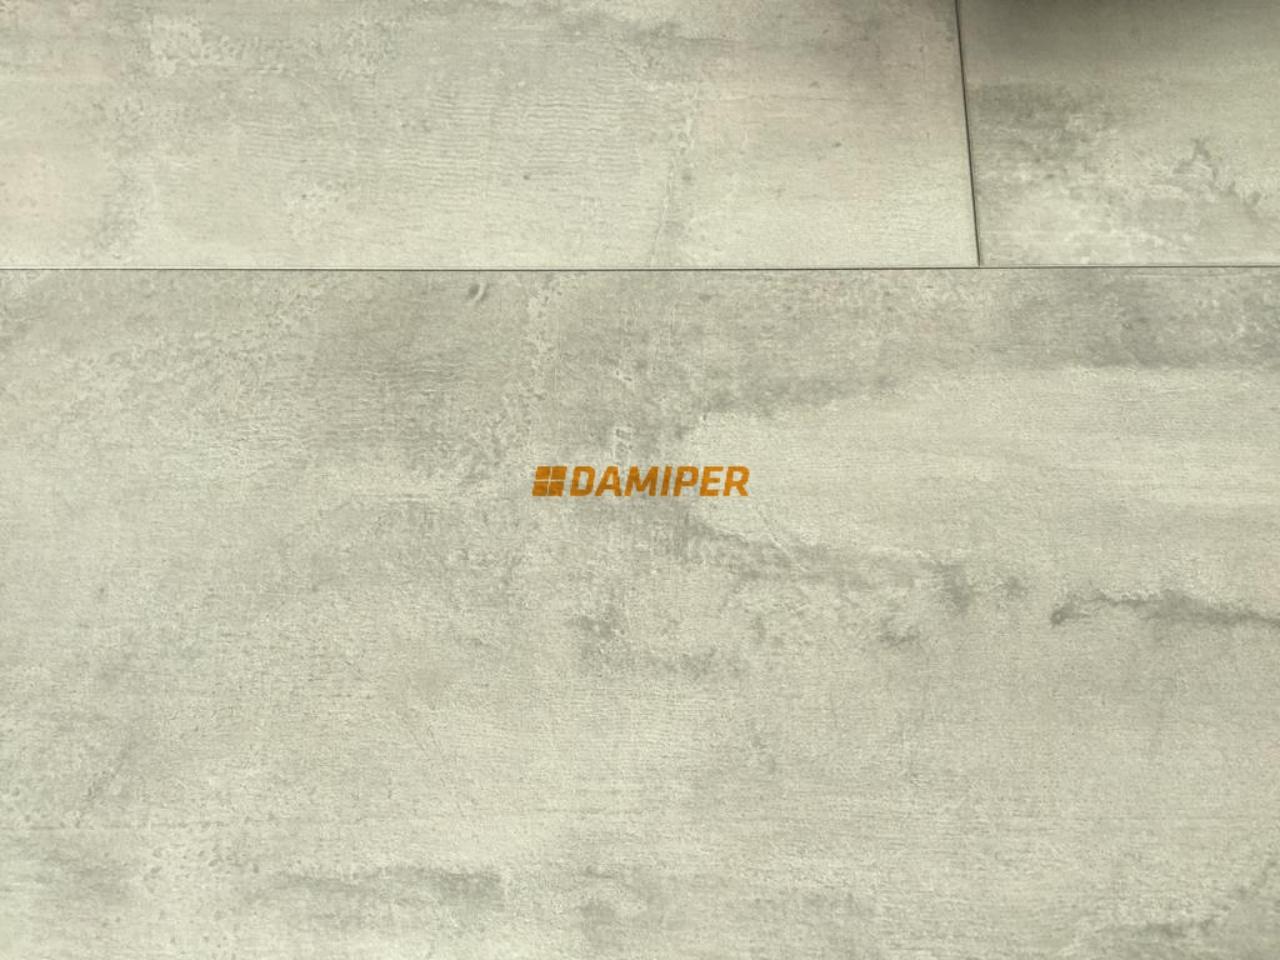 kompozitne_podlahy_h2o_floor_kronooriginal_1528_bridlica_submarine_damiper